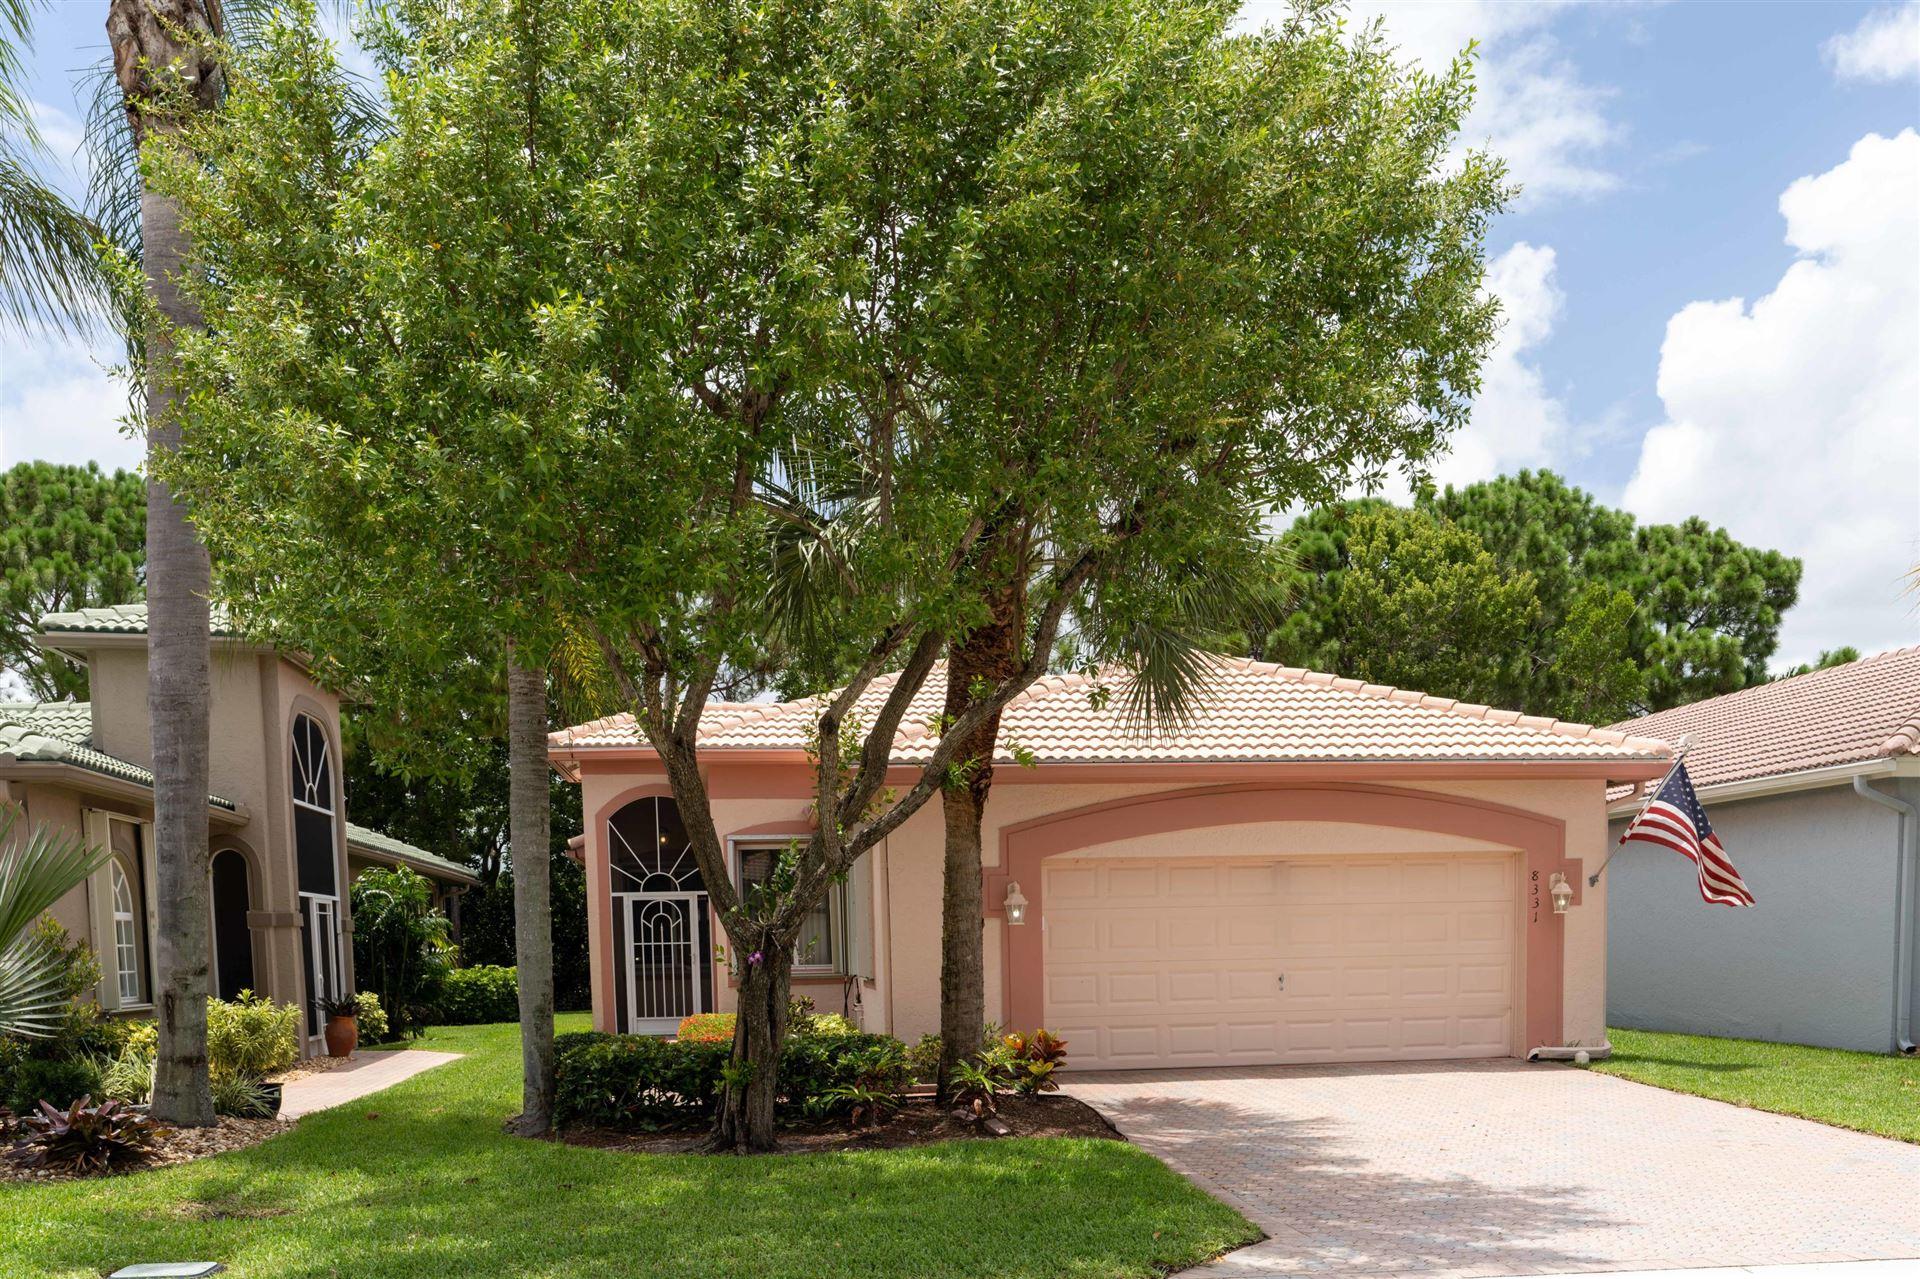 8331 Siciliano Street, Boynton Beach, FL 33472 - MLS#: RX-10731419